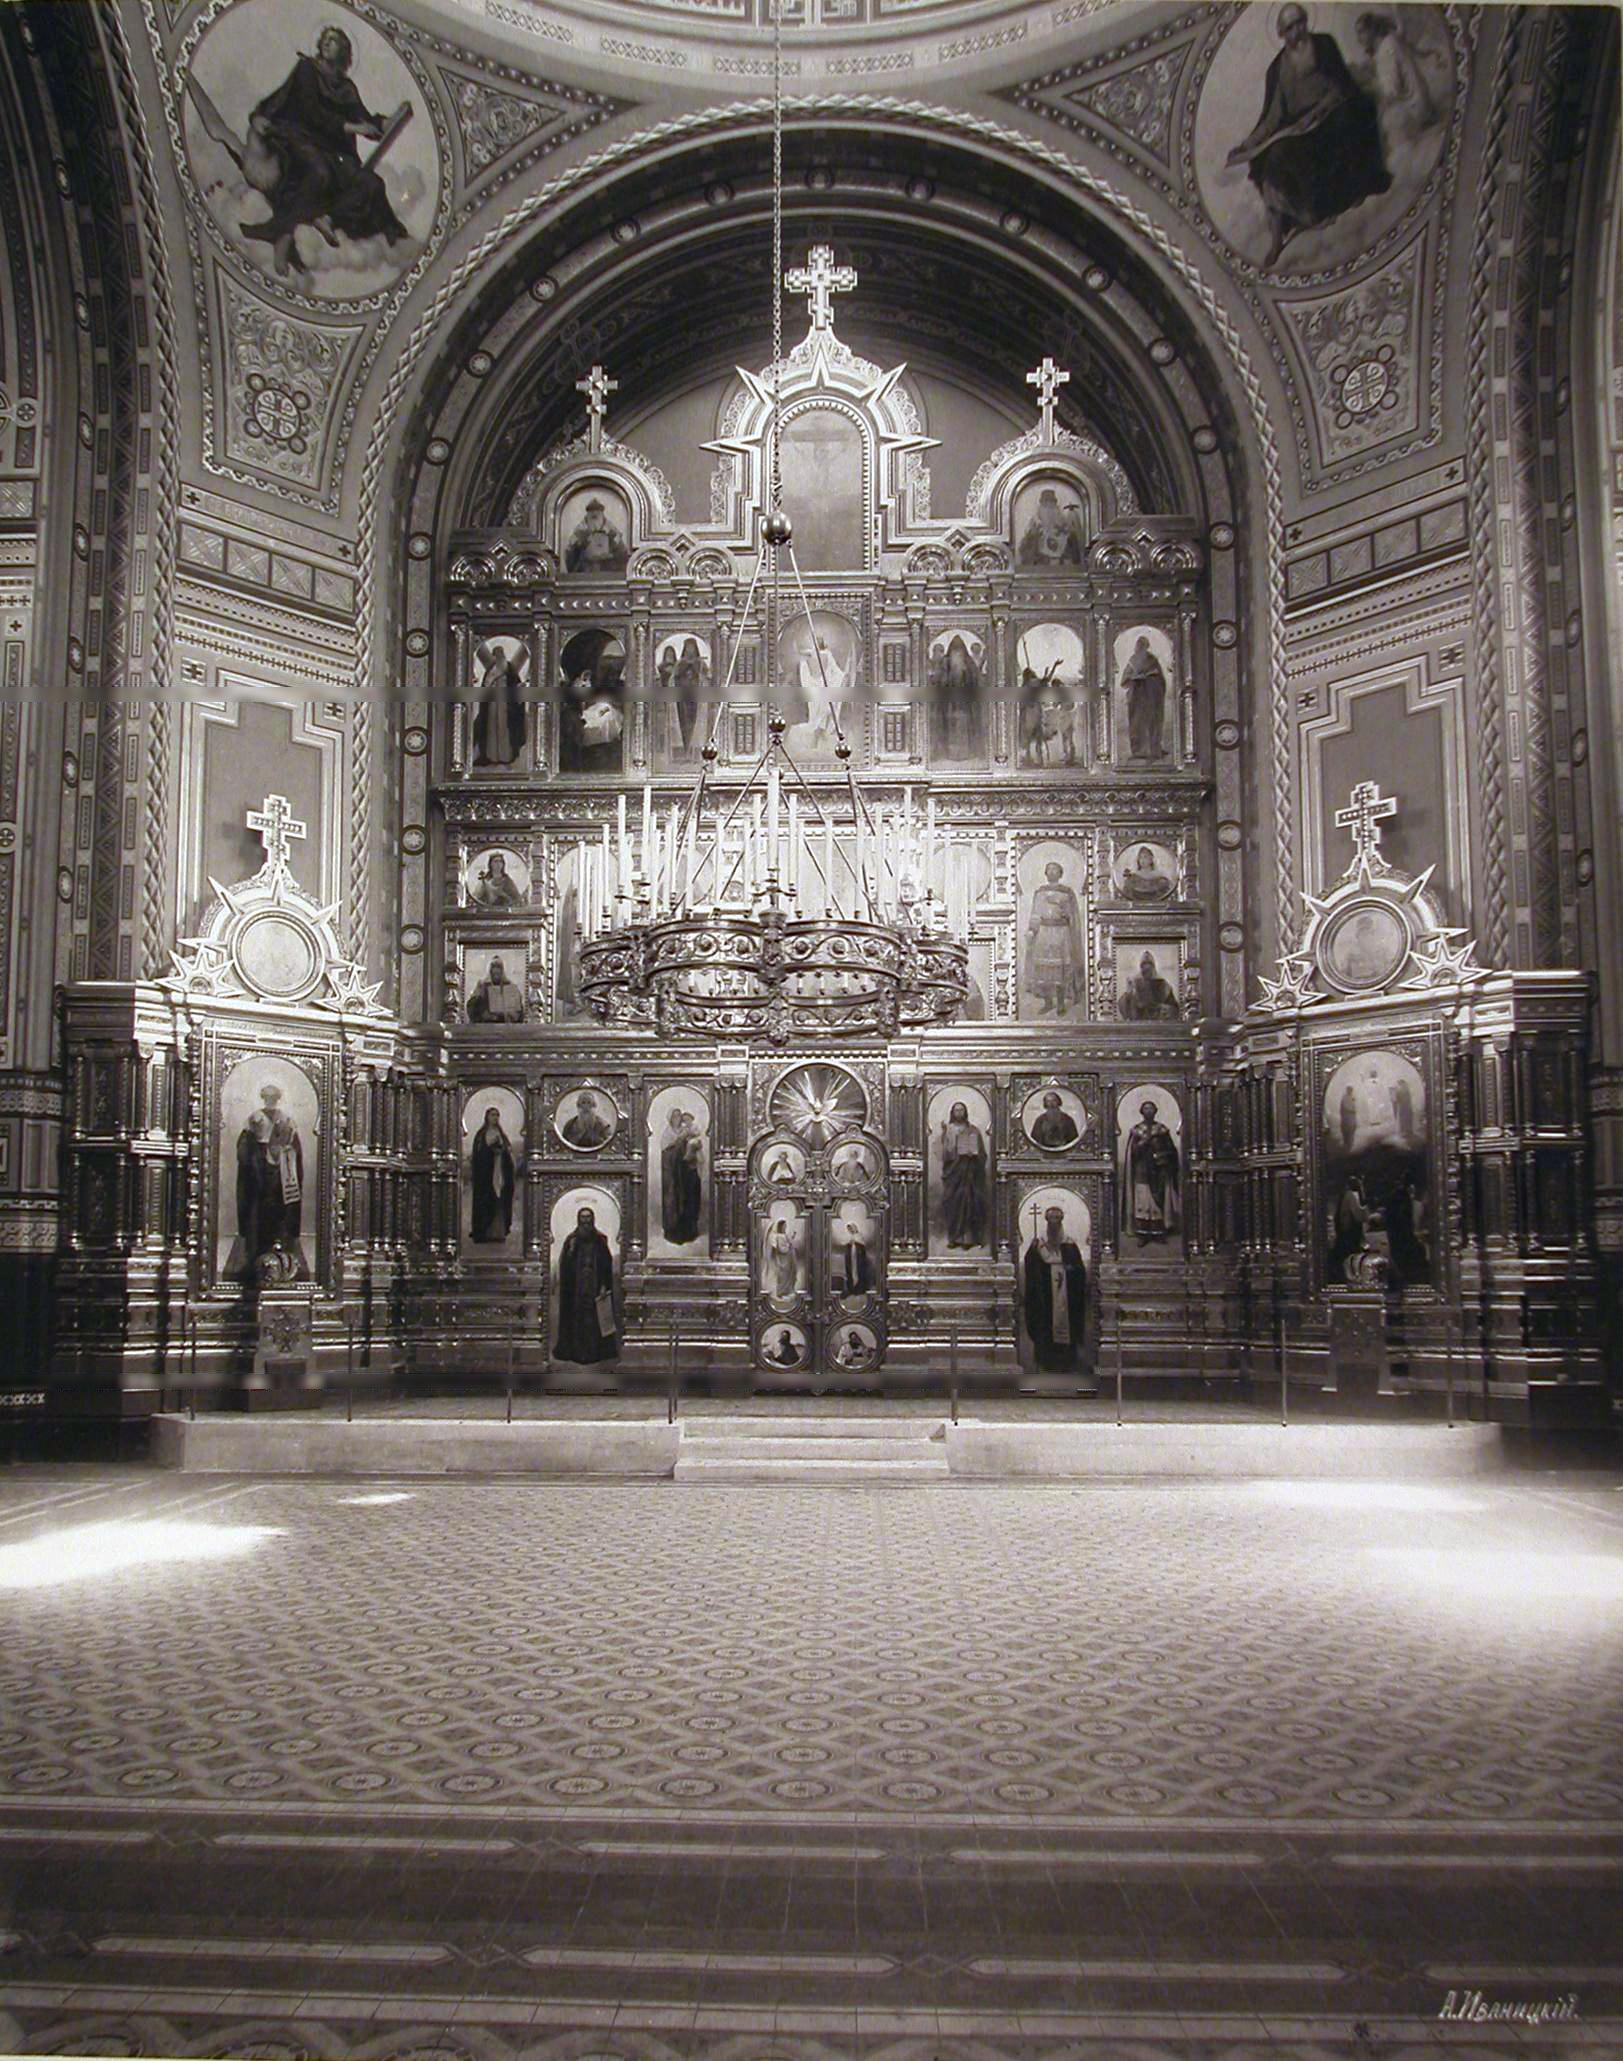 Filechrist The Savior Cathedral In Borki Interior View 2